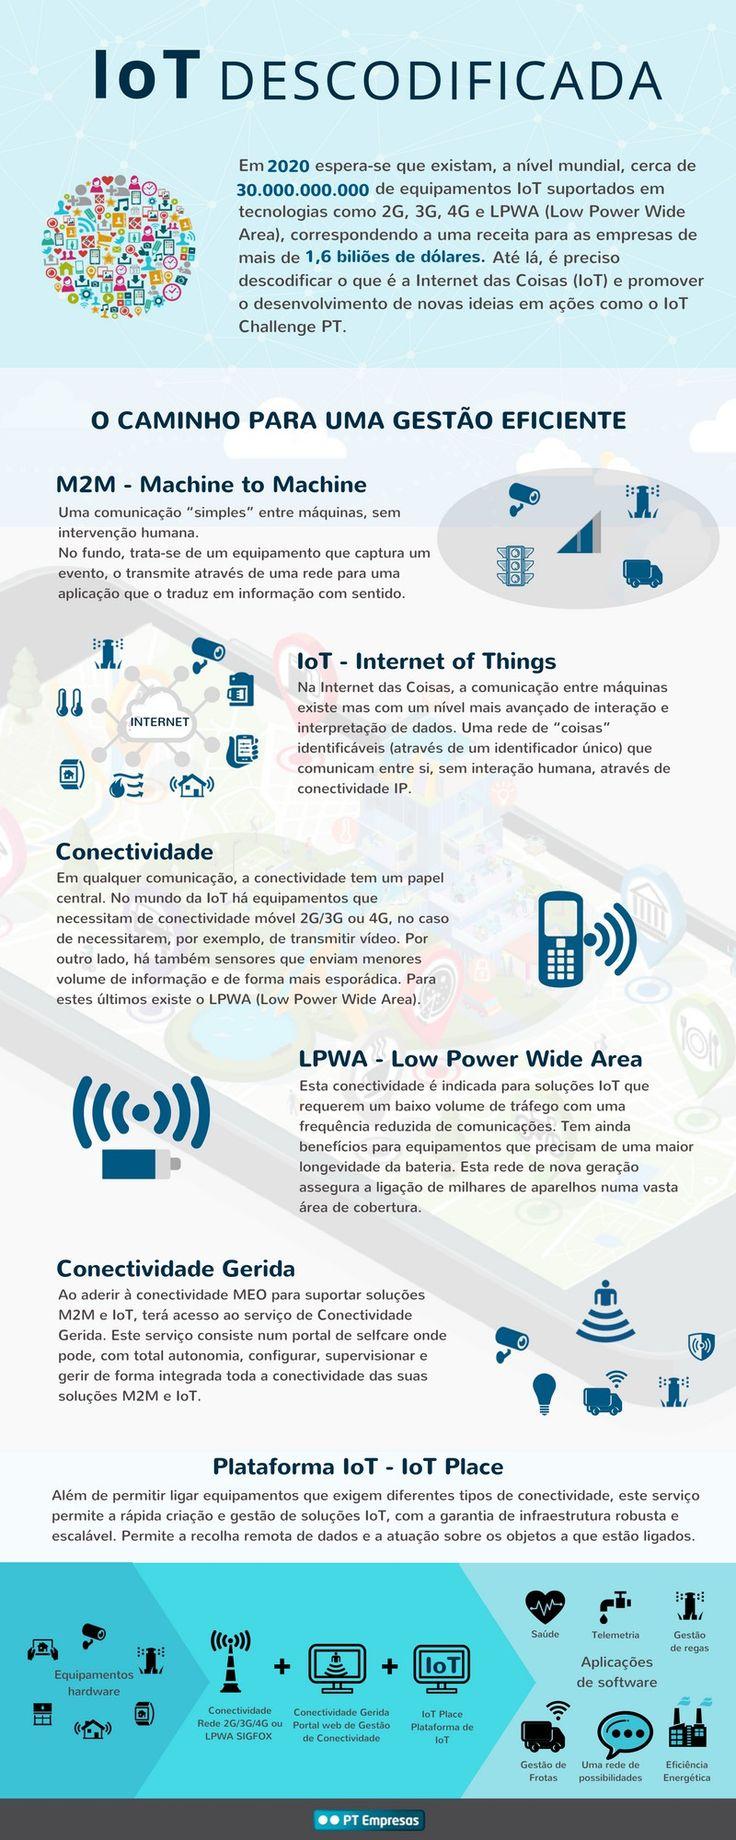 Infografia: a Internet das Coisas descodificada